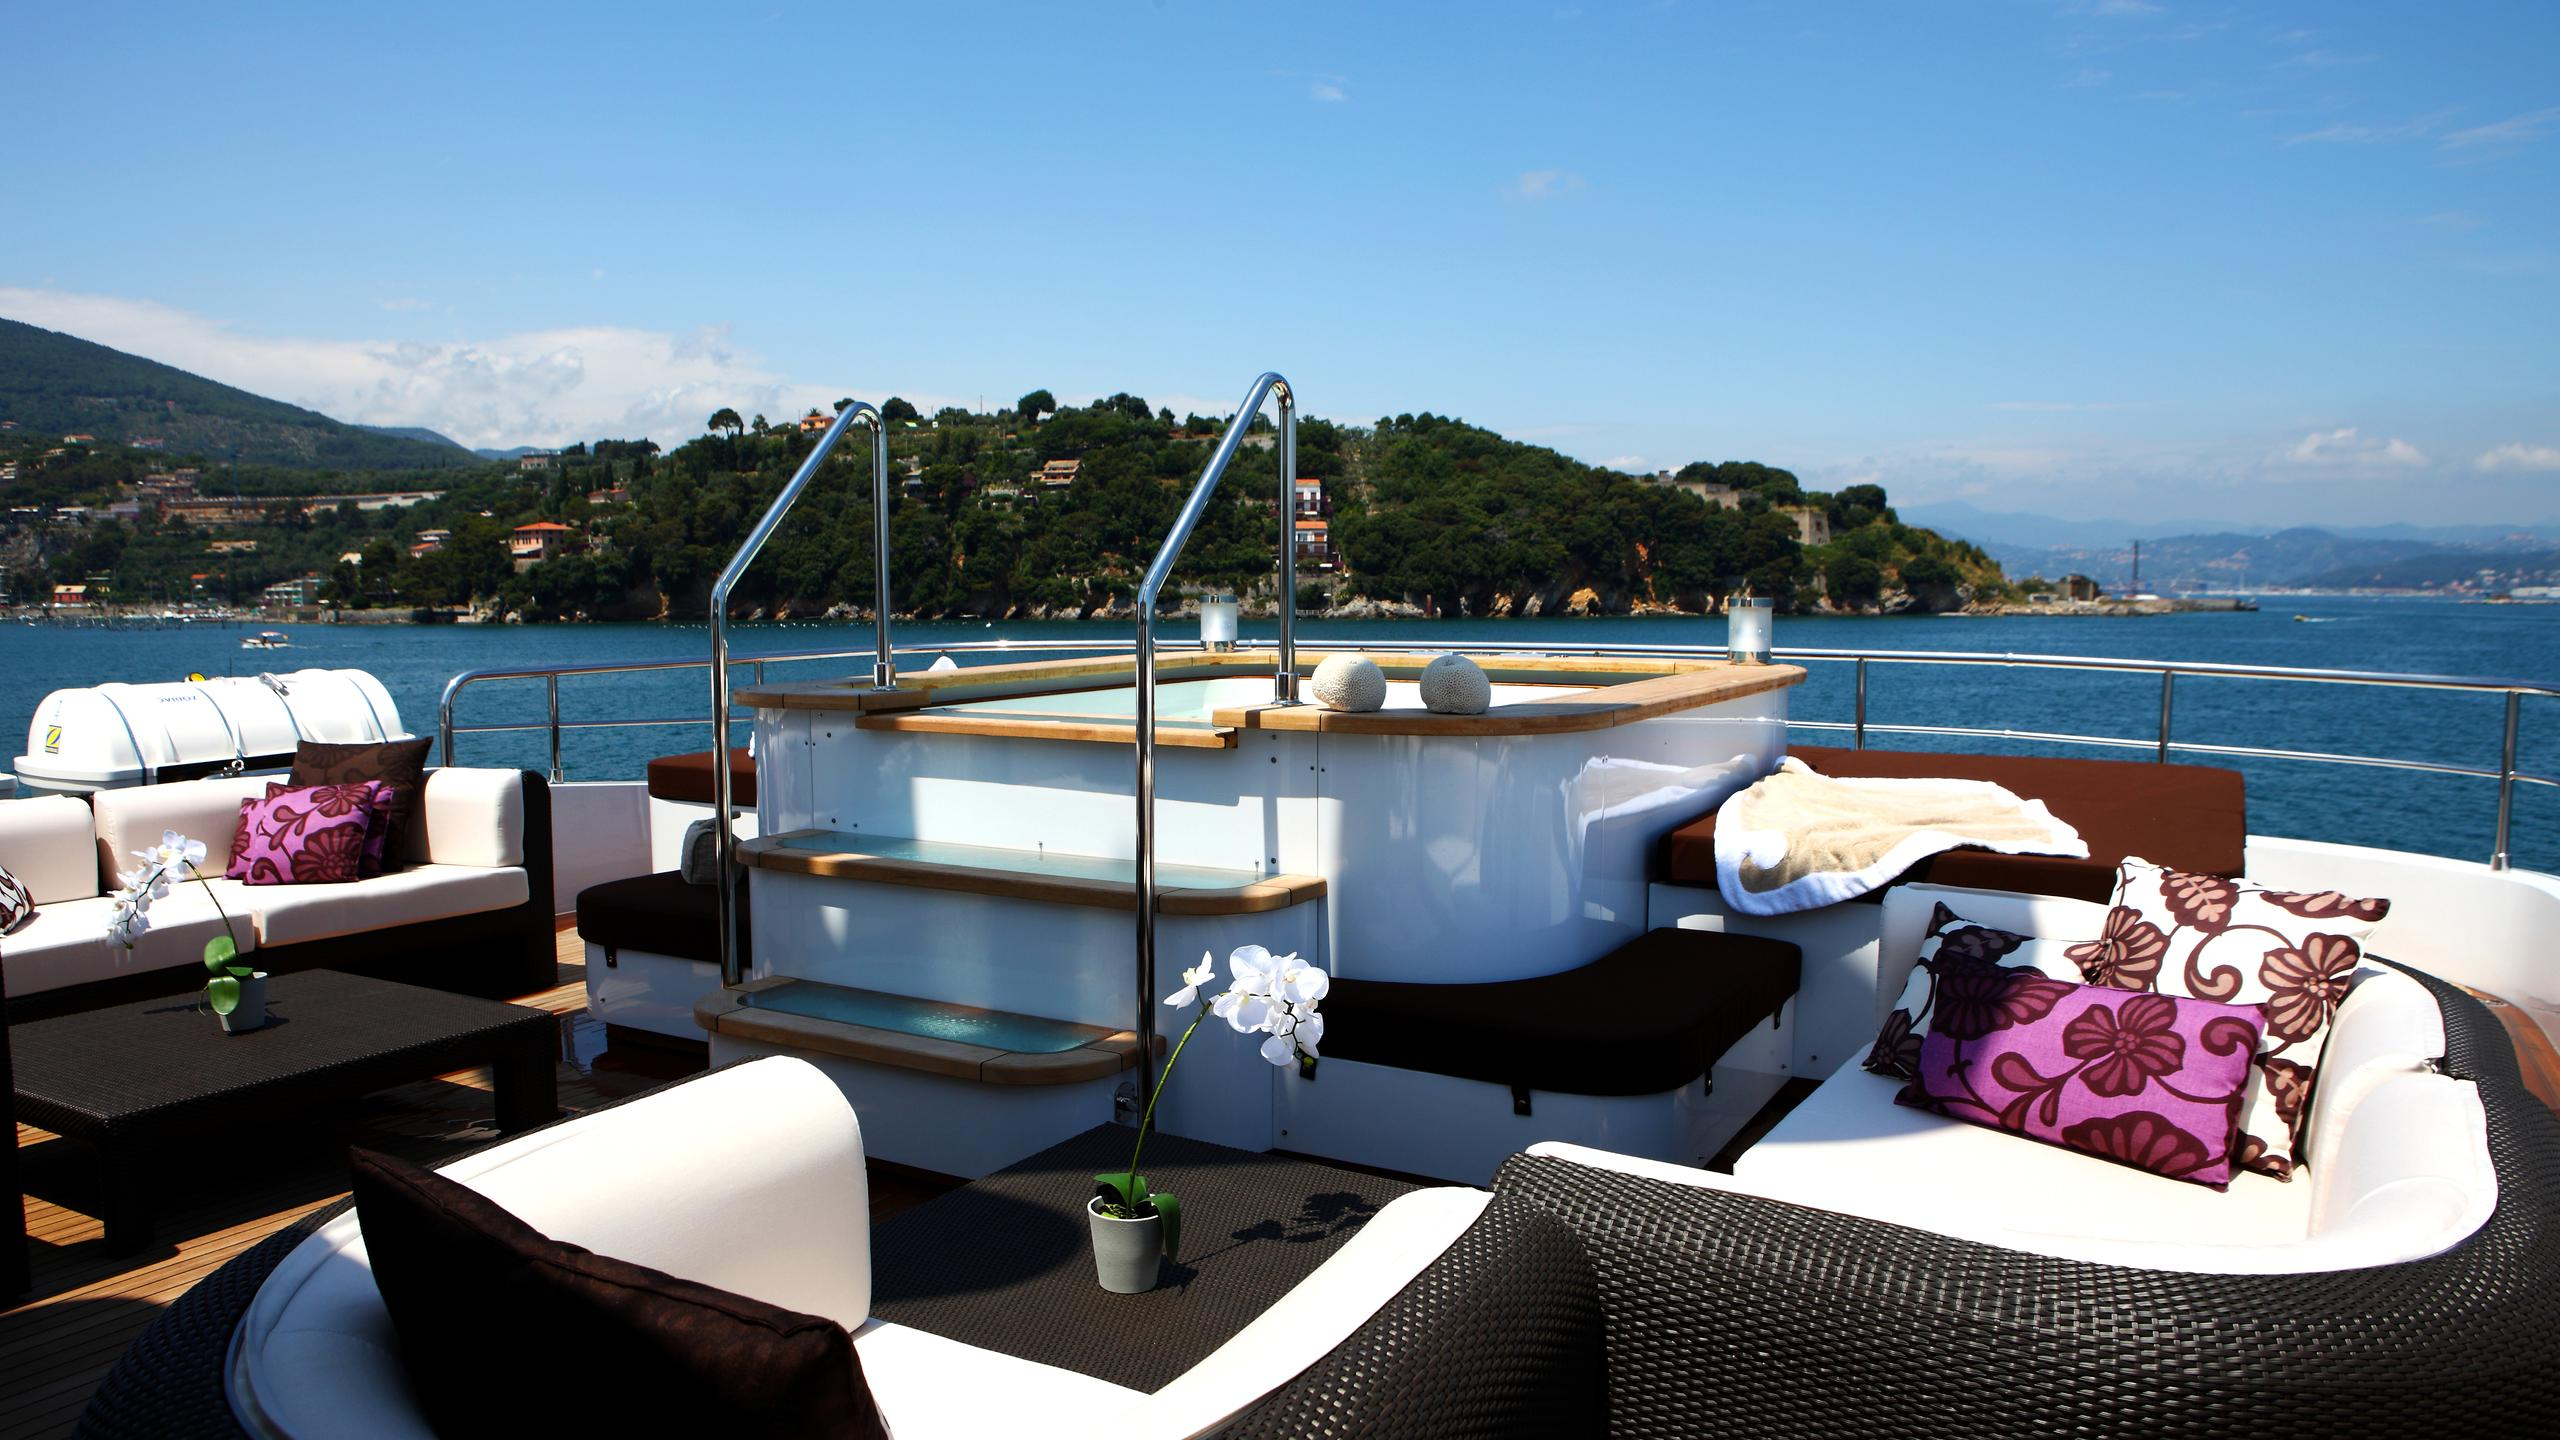 zaliv-iii-yacht-jacuzzi